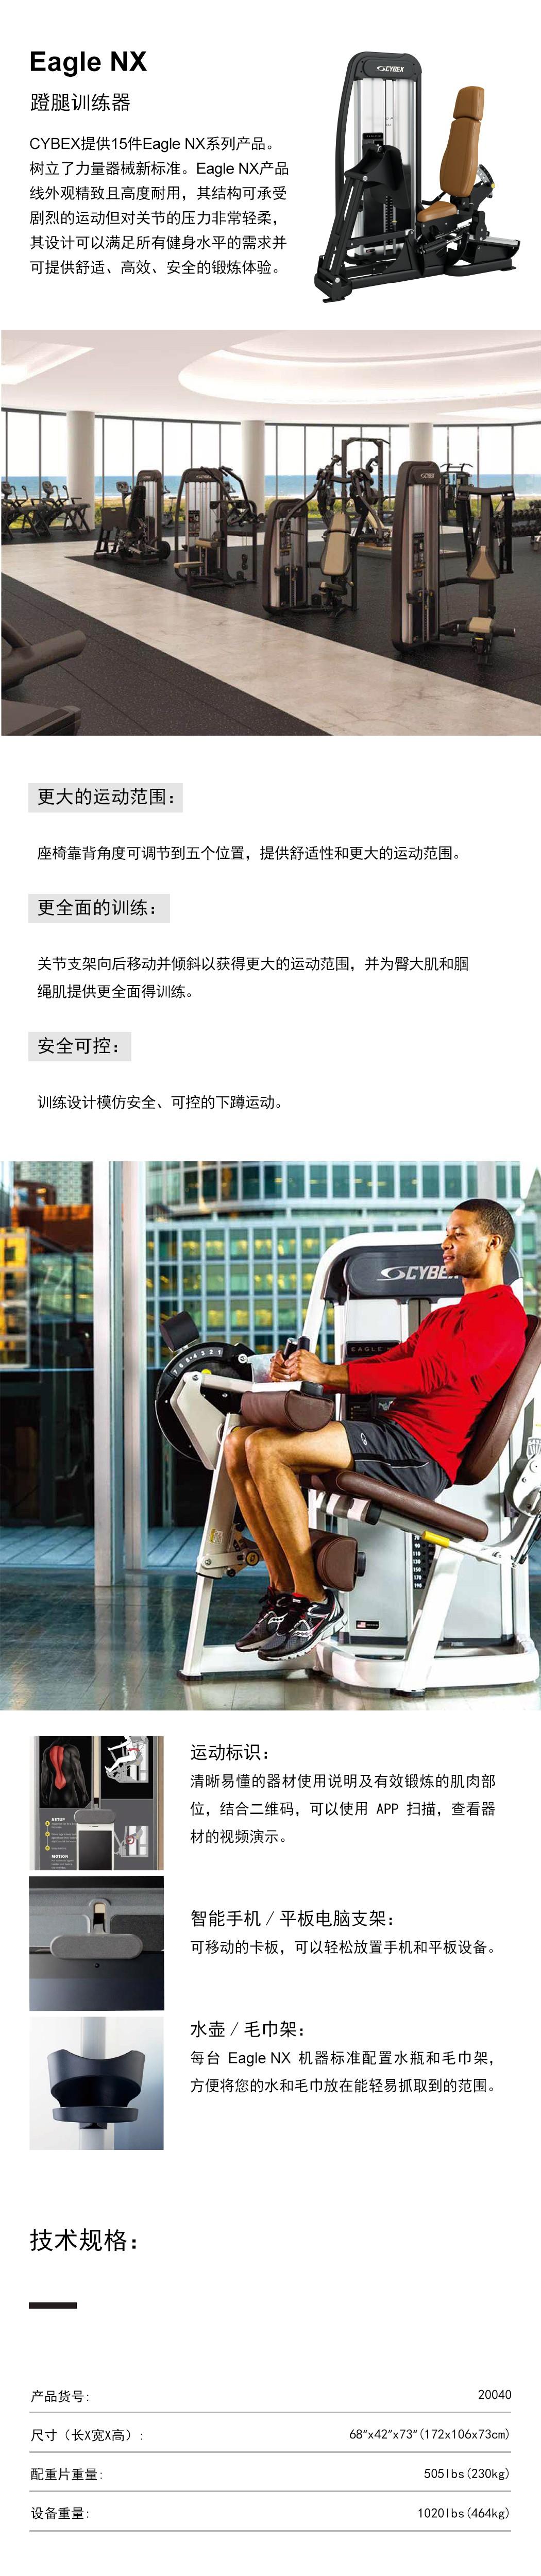 cybex-蹬腿训练器.jpg